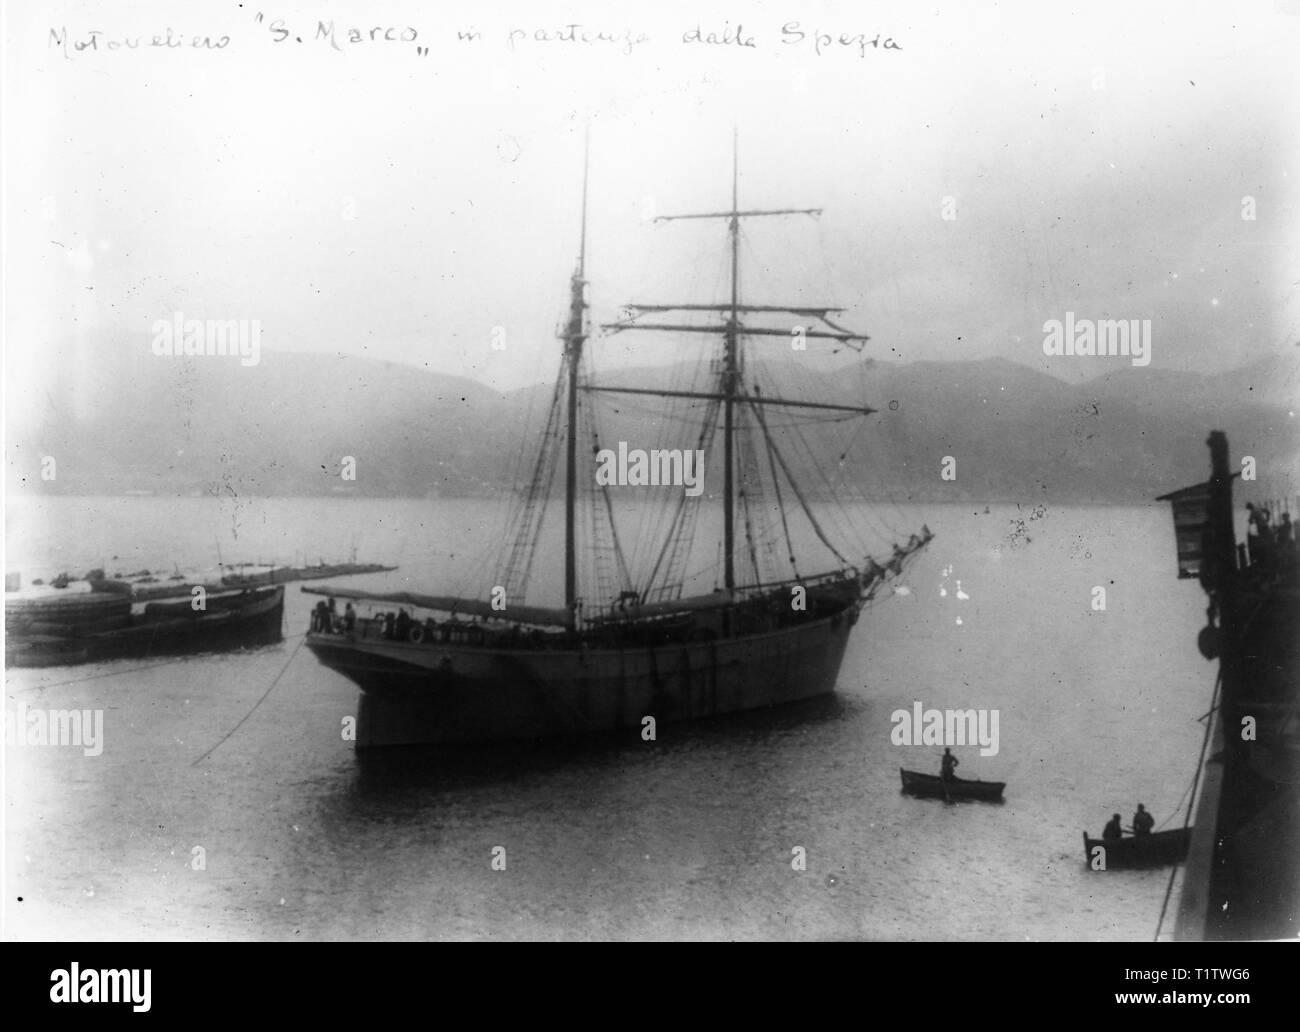 Sail Boat, mediterranean sea, italy - Stock Image